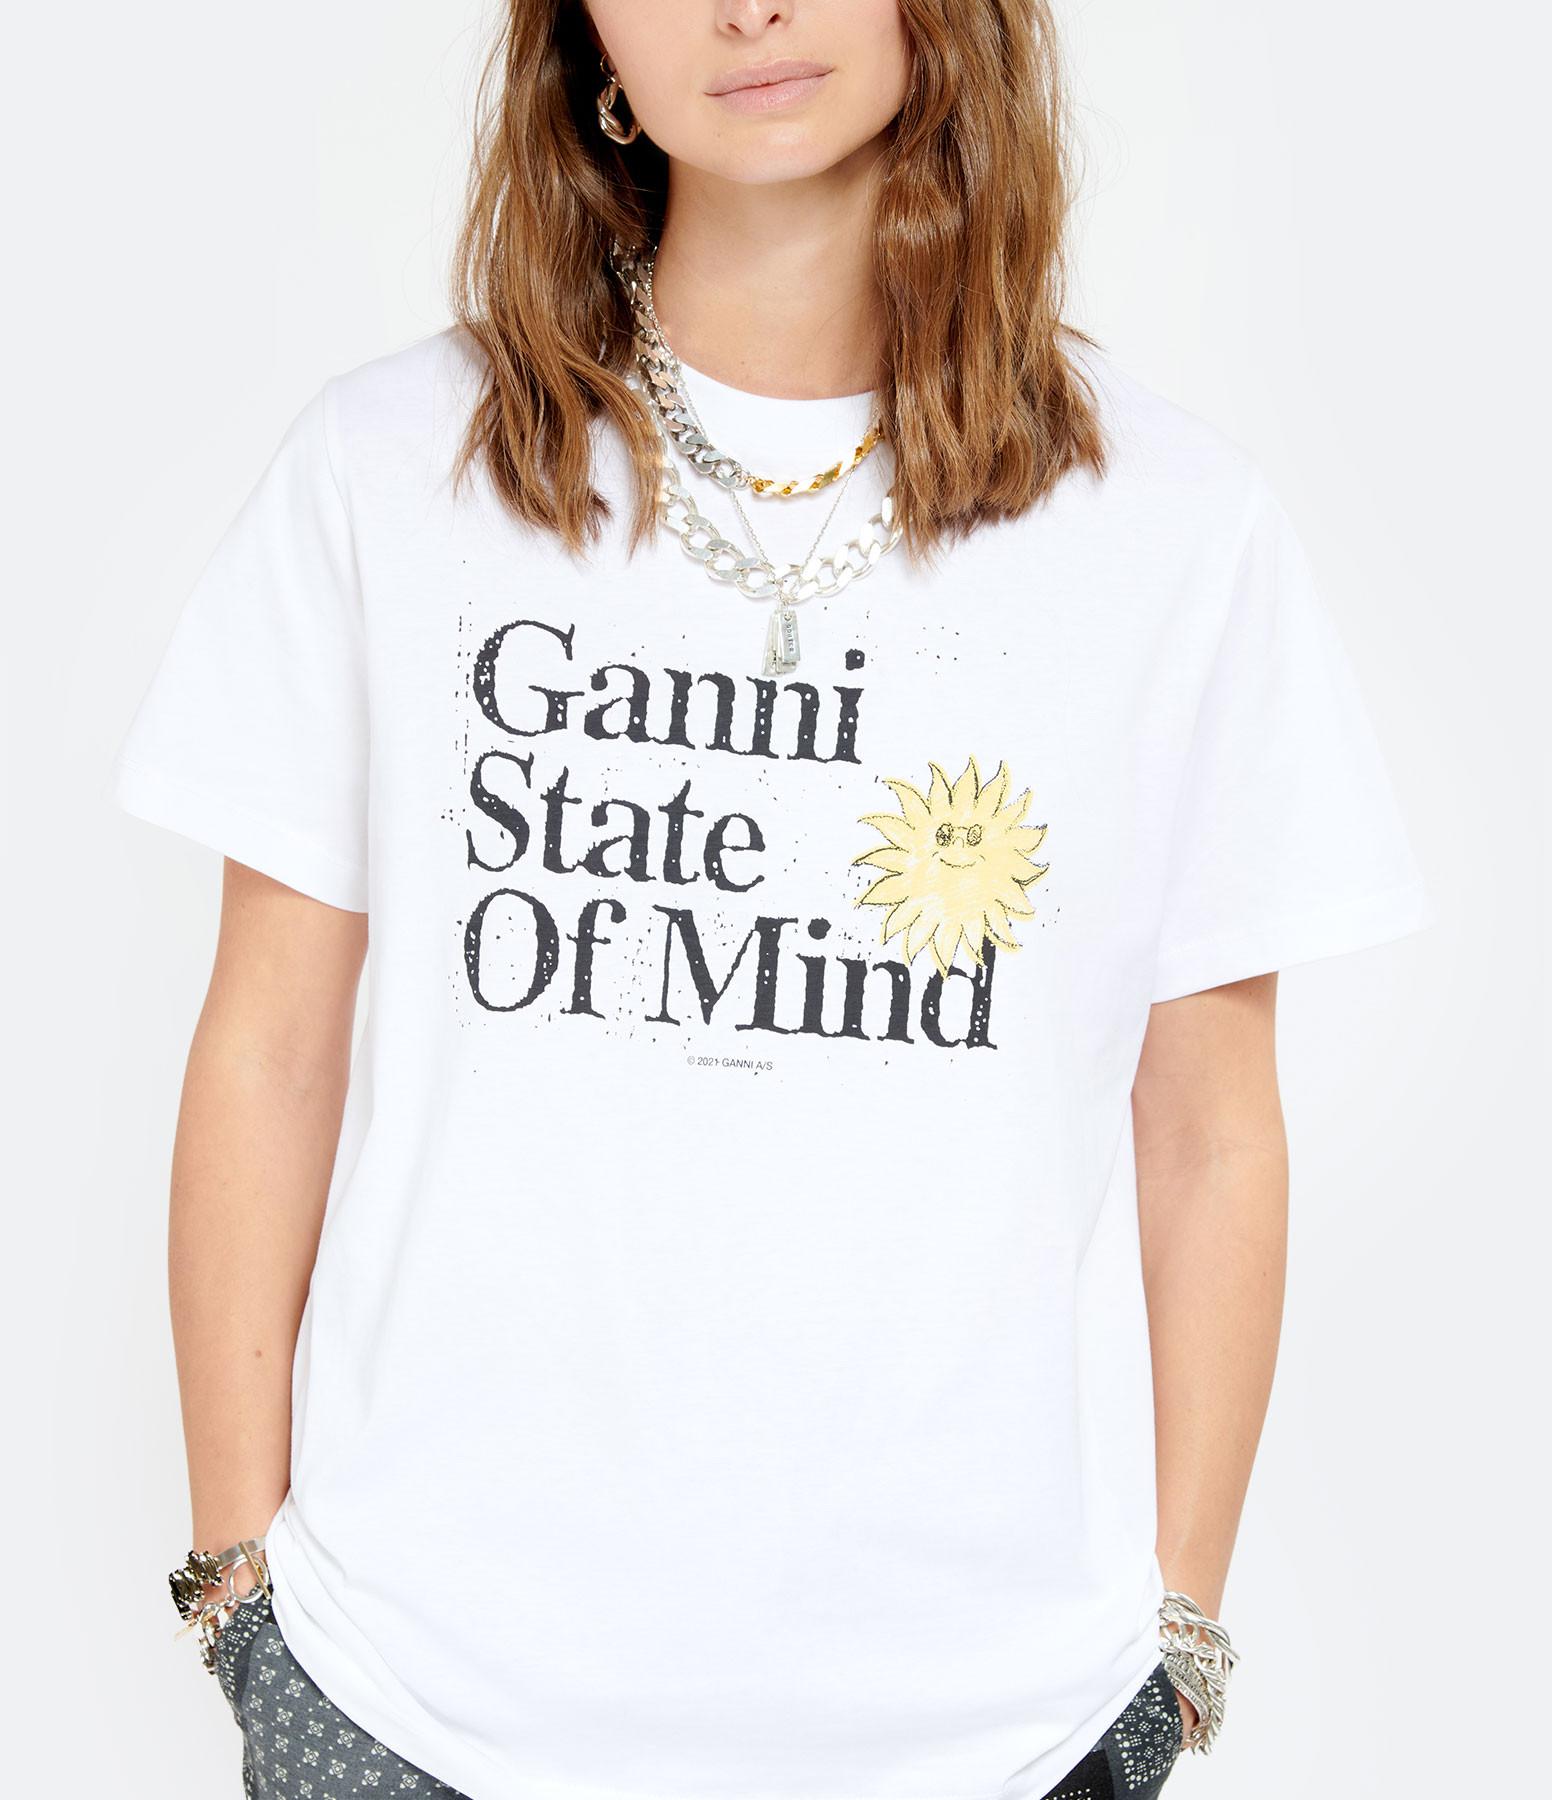 GANNI - Tee-shirt Ganni State Of Mind Coton Bio Blanc